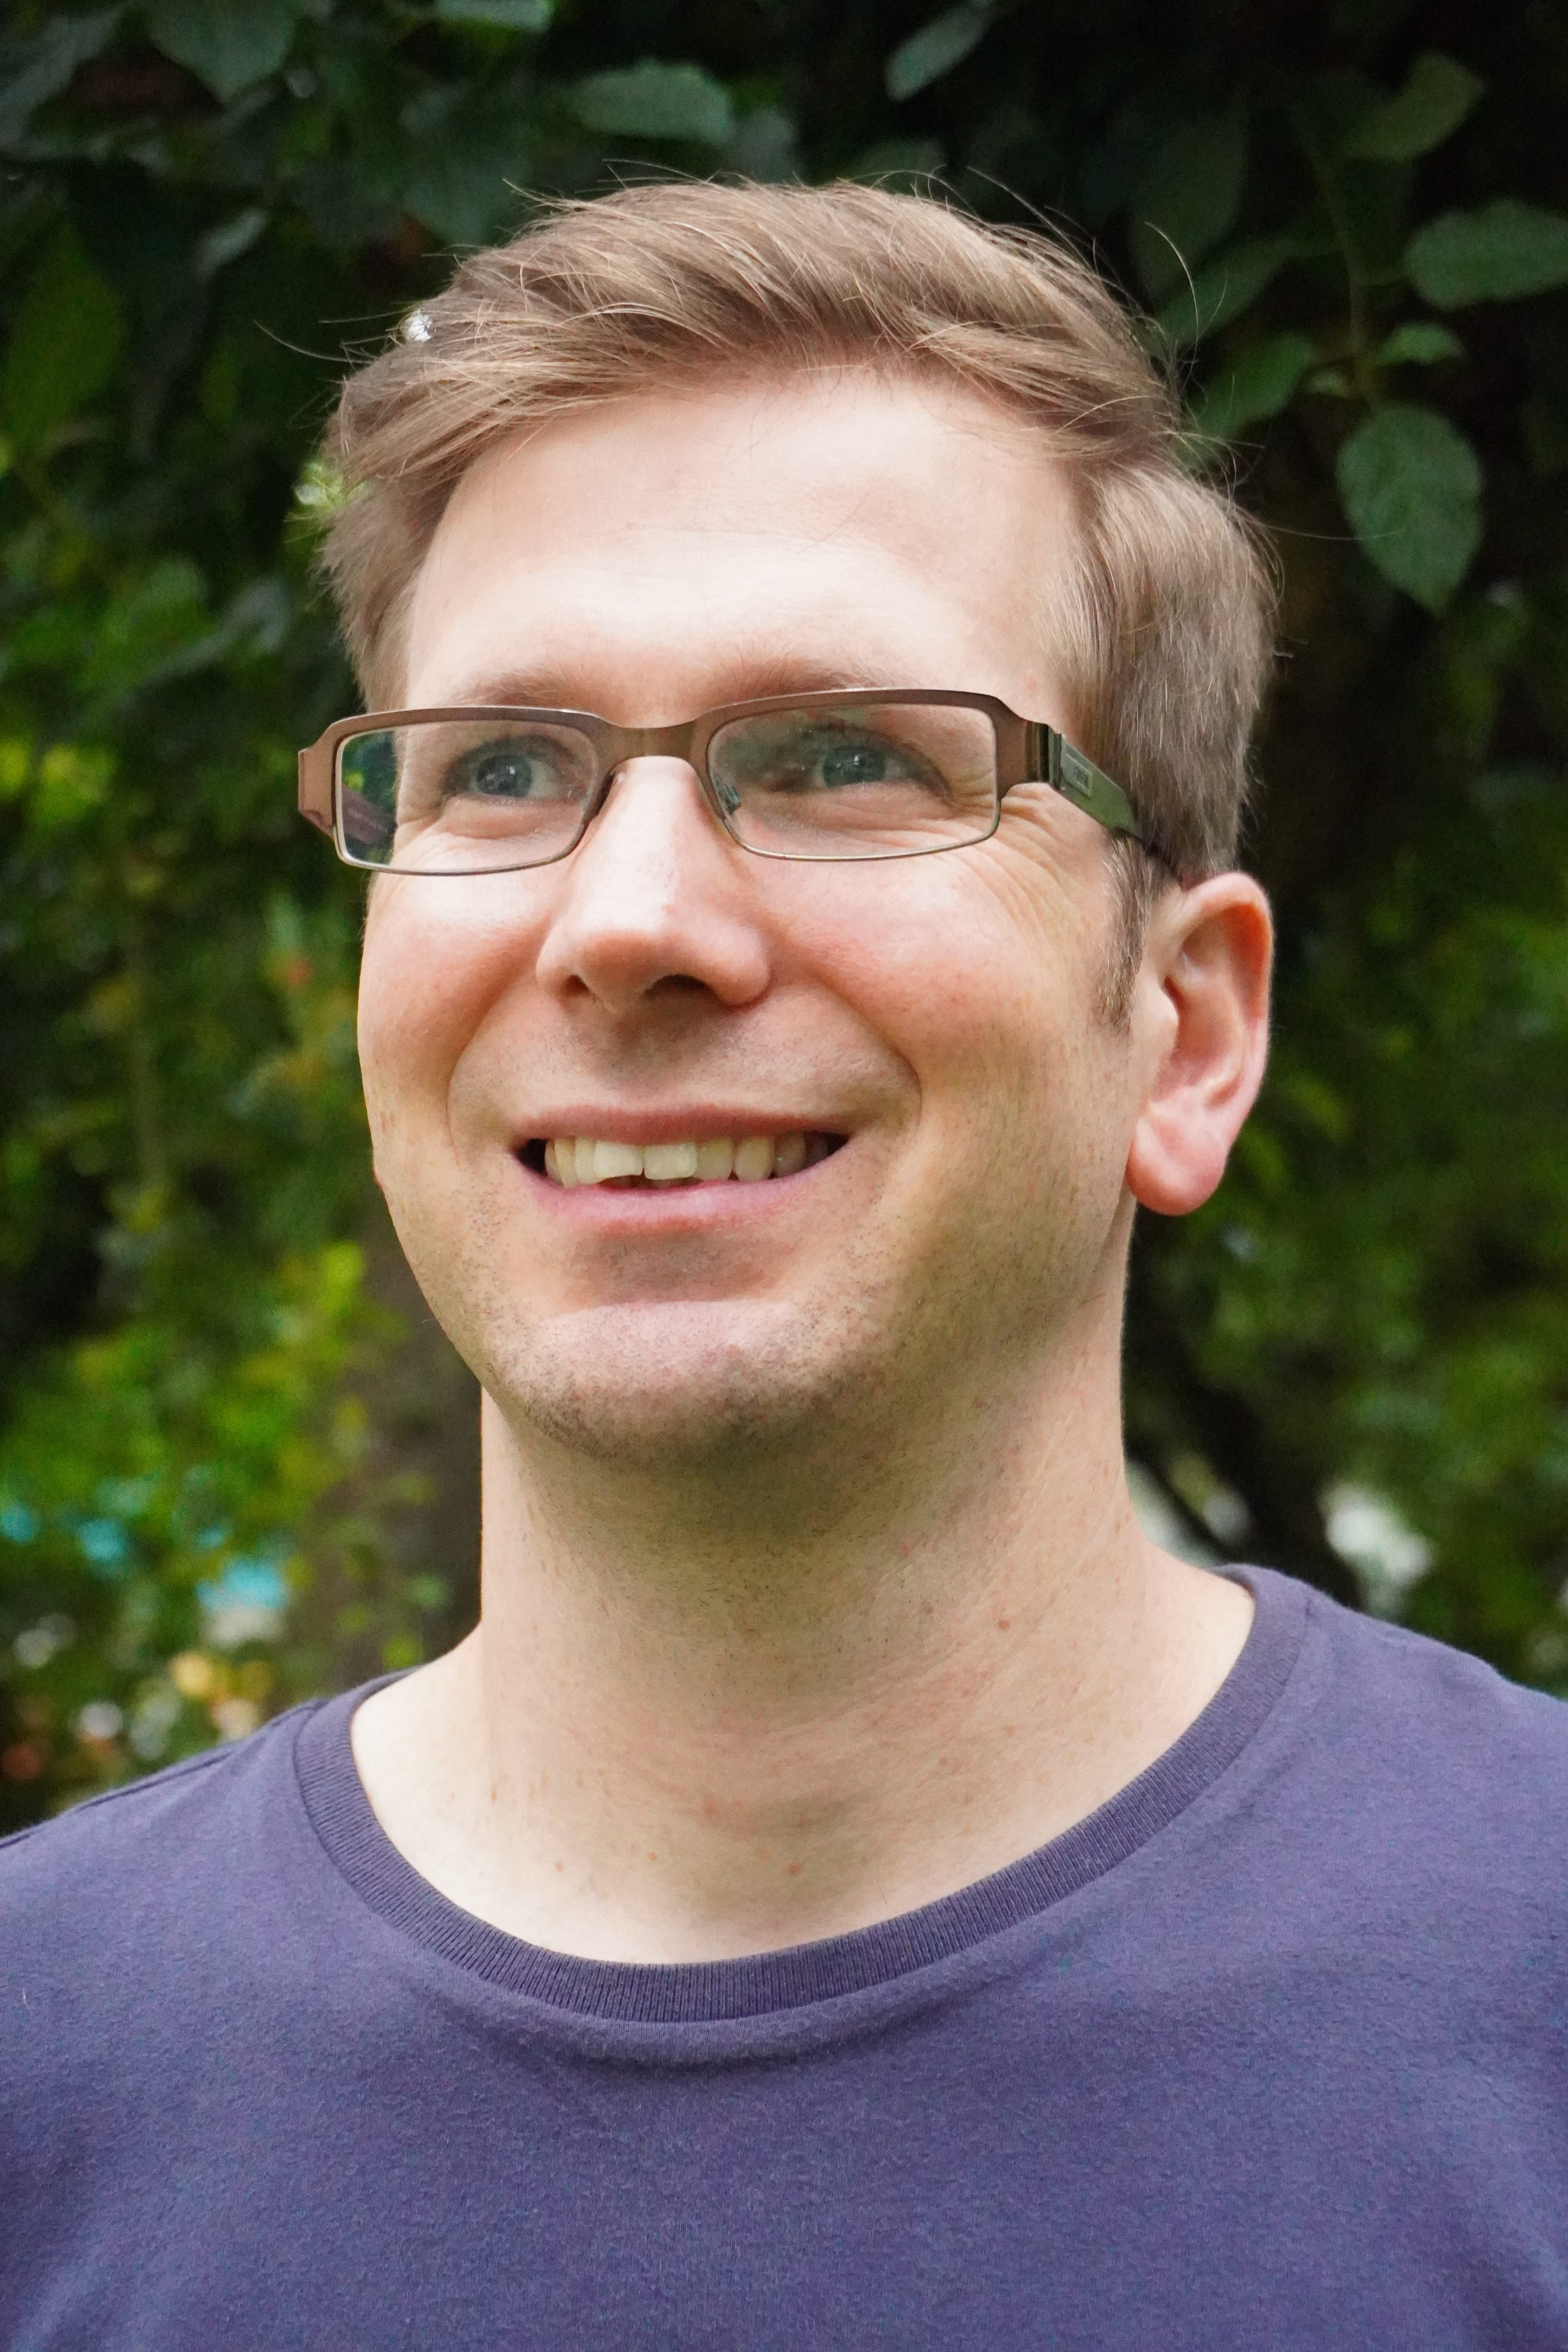 Lukas Breitenmoser